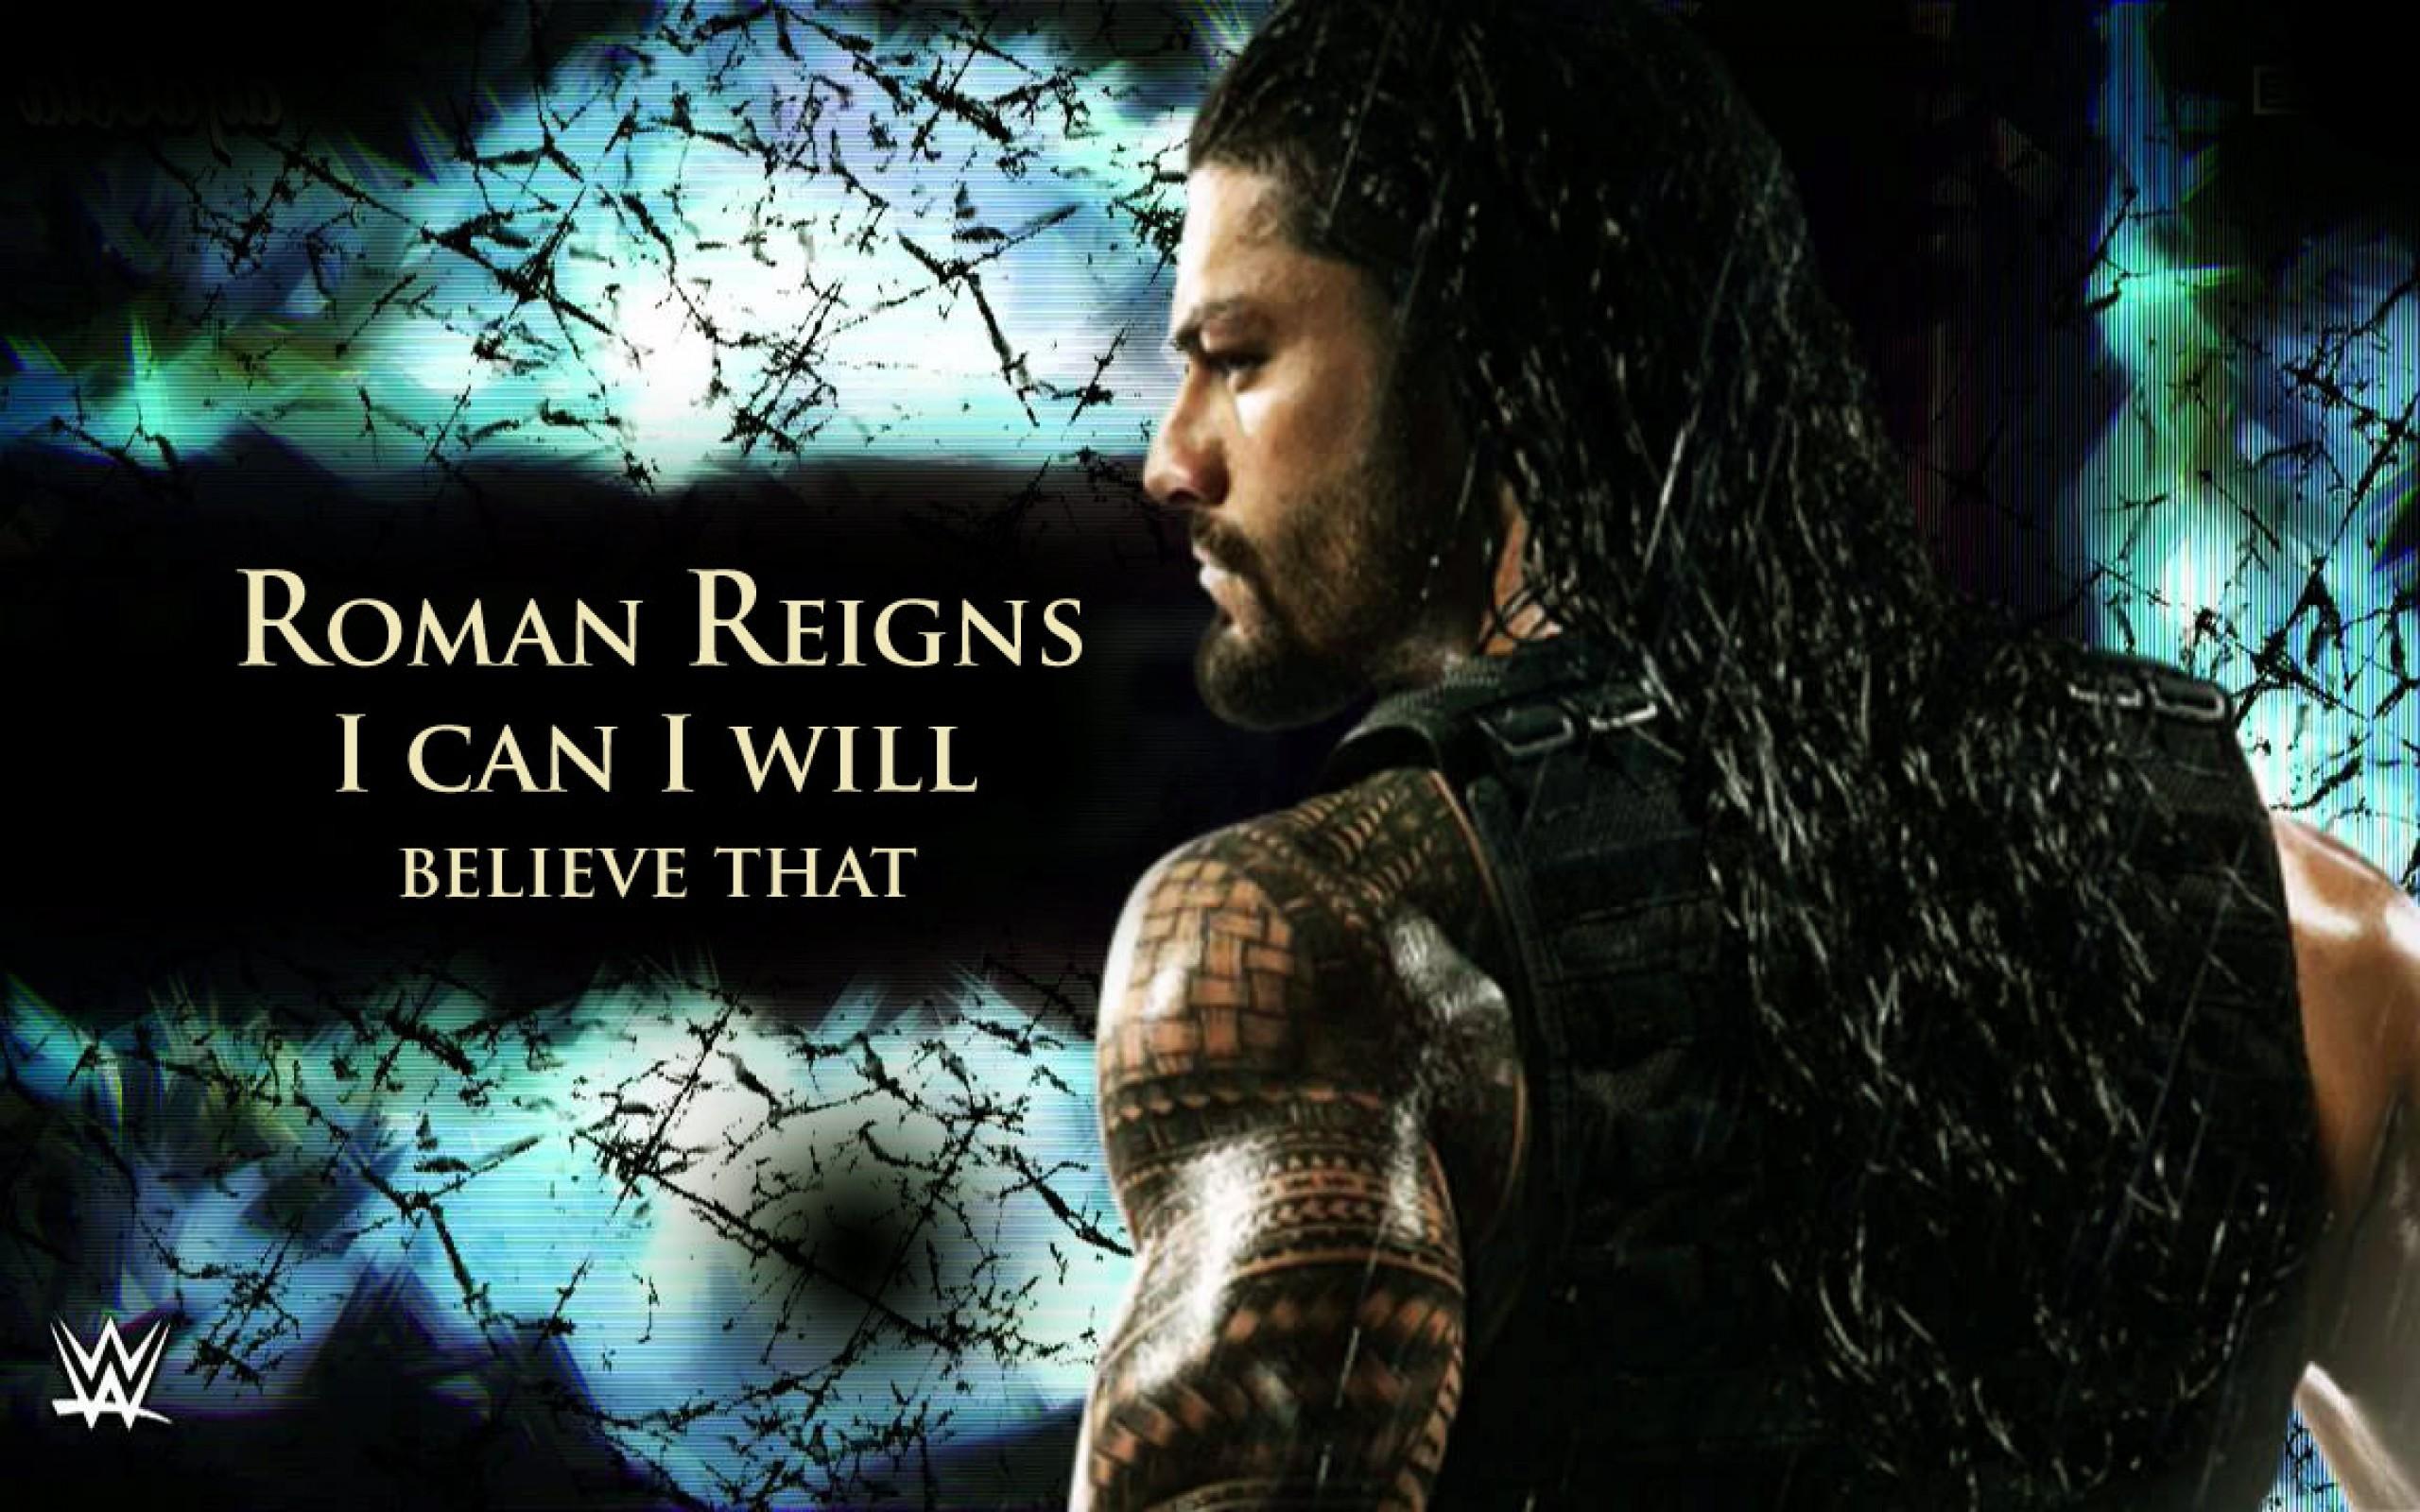 Hd Roman Reigns Wallpaper: Roman Reigns Desktop Wallpaper (72+ Images